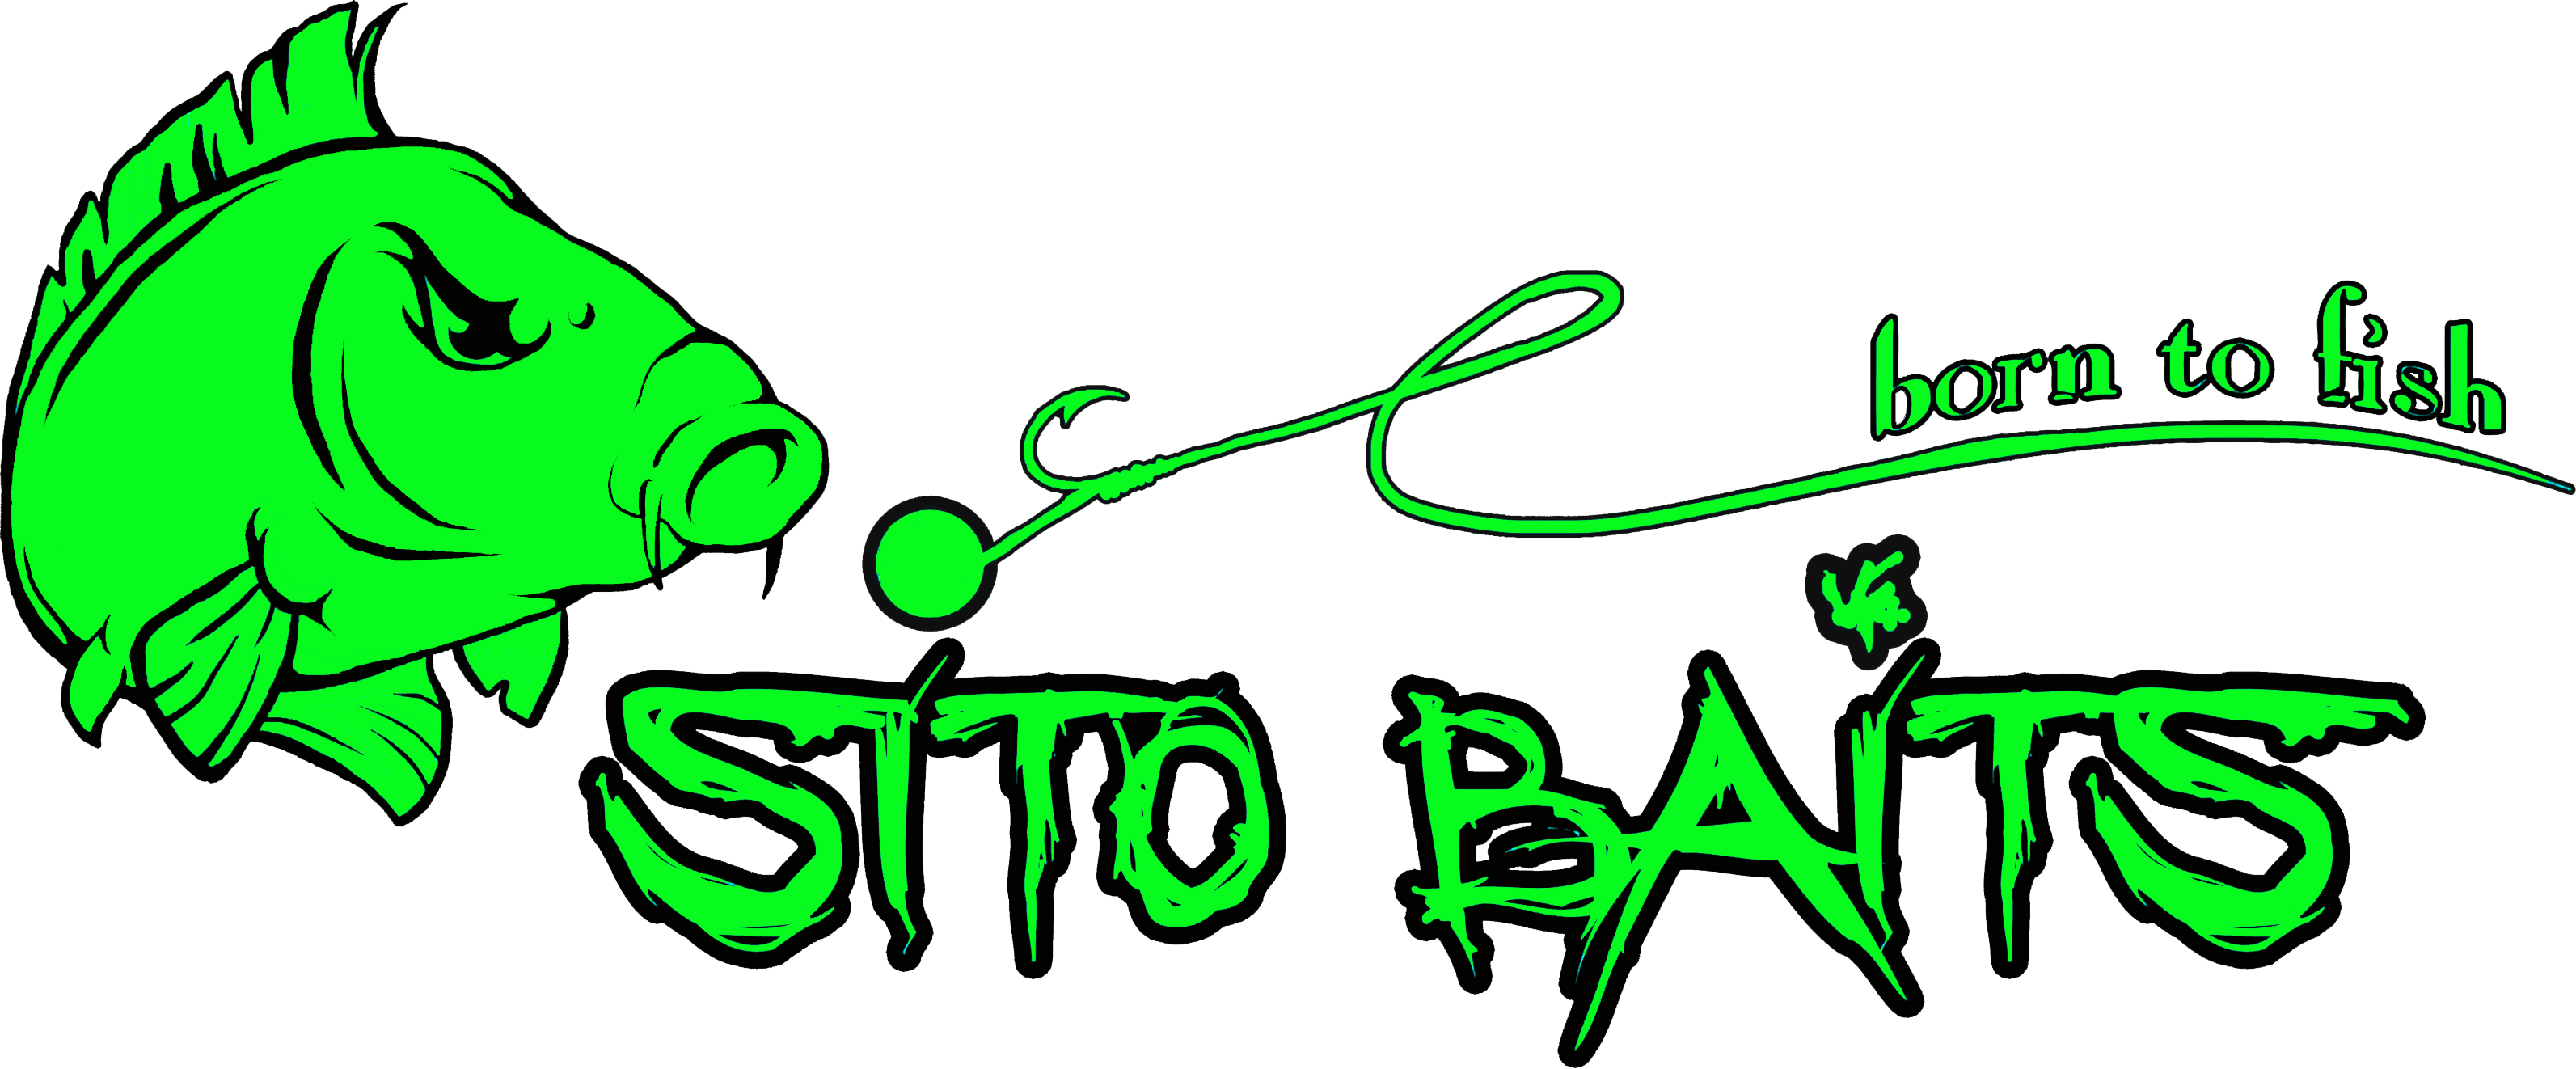 Sito Baits